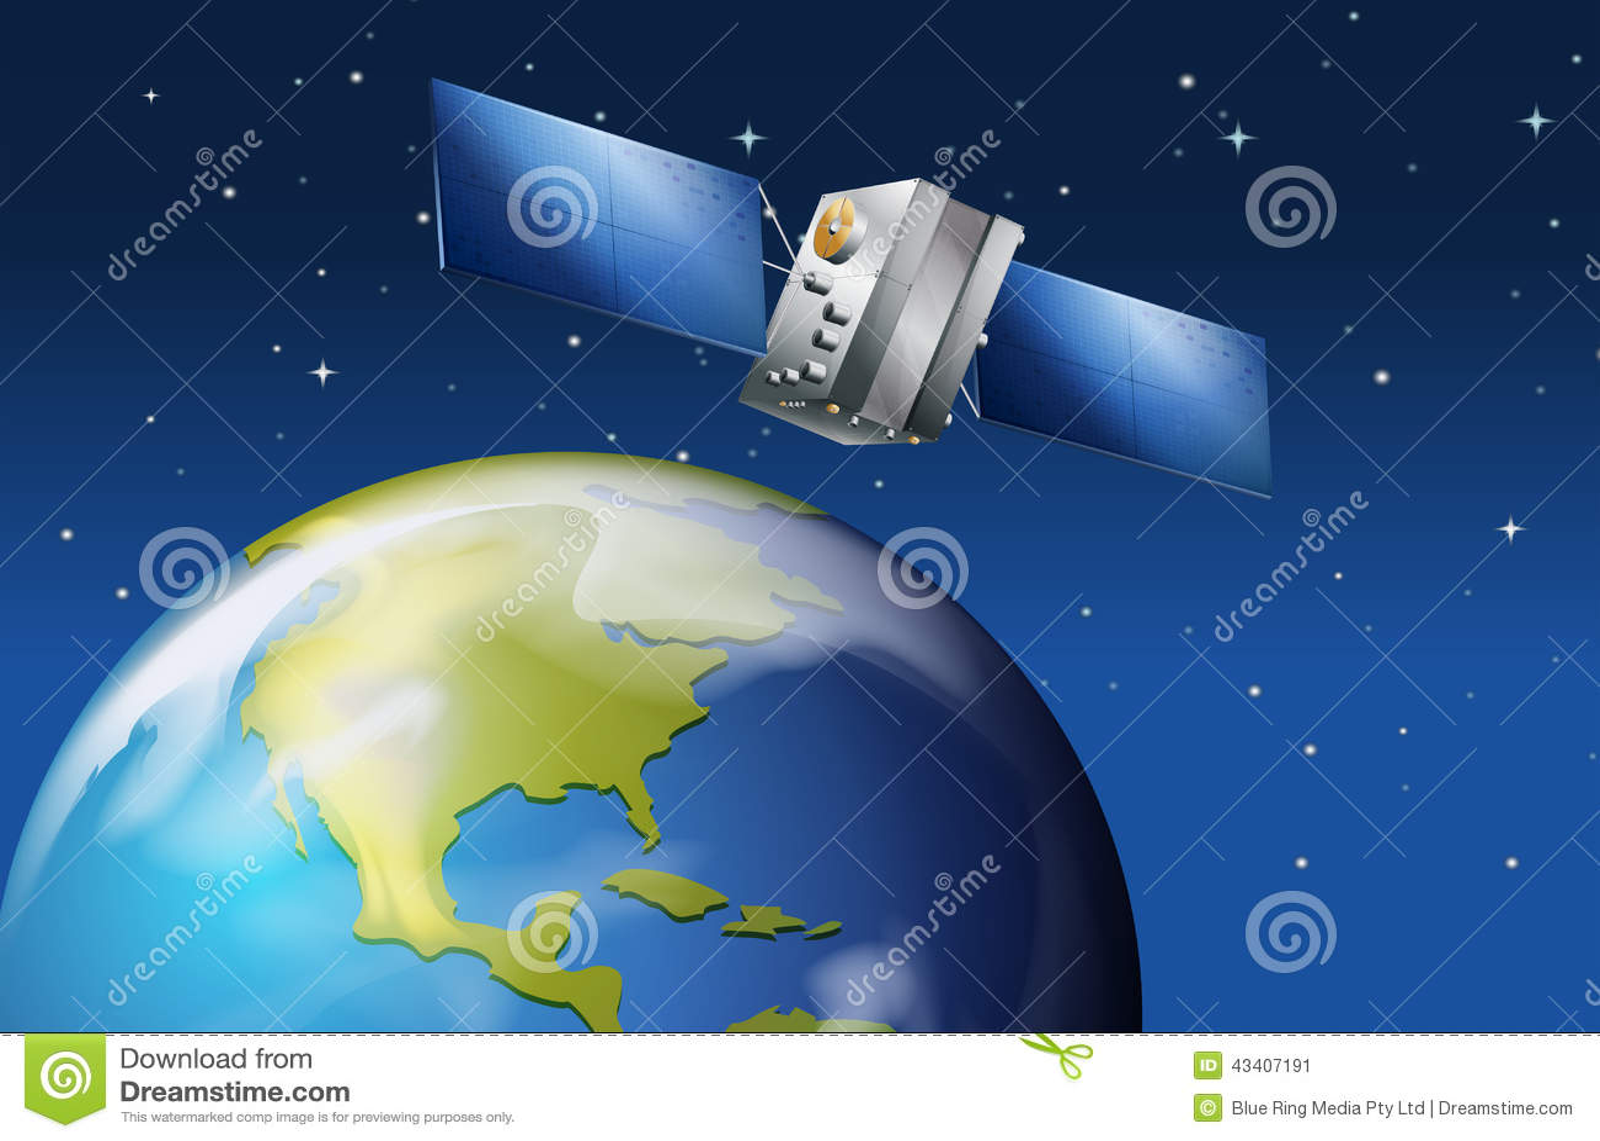 Satelitte nahe der Planet Erde